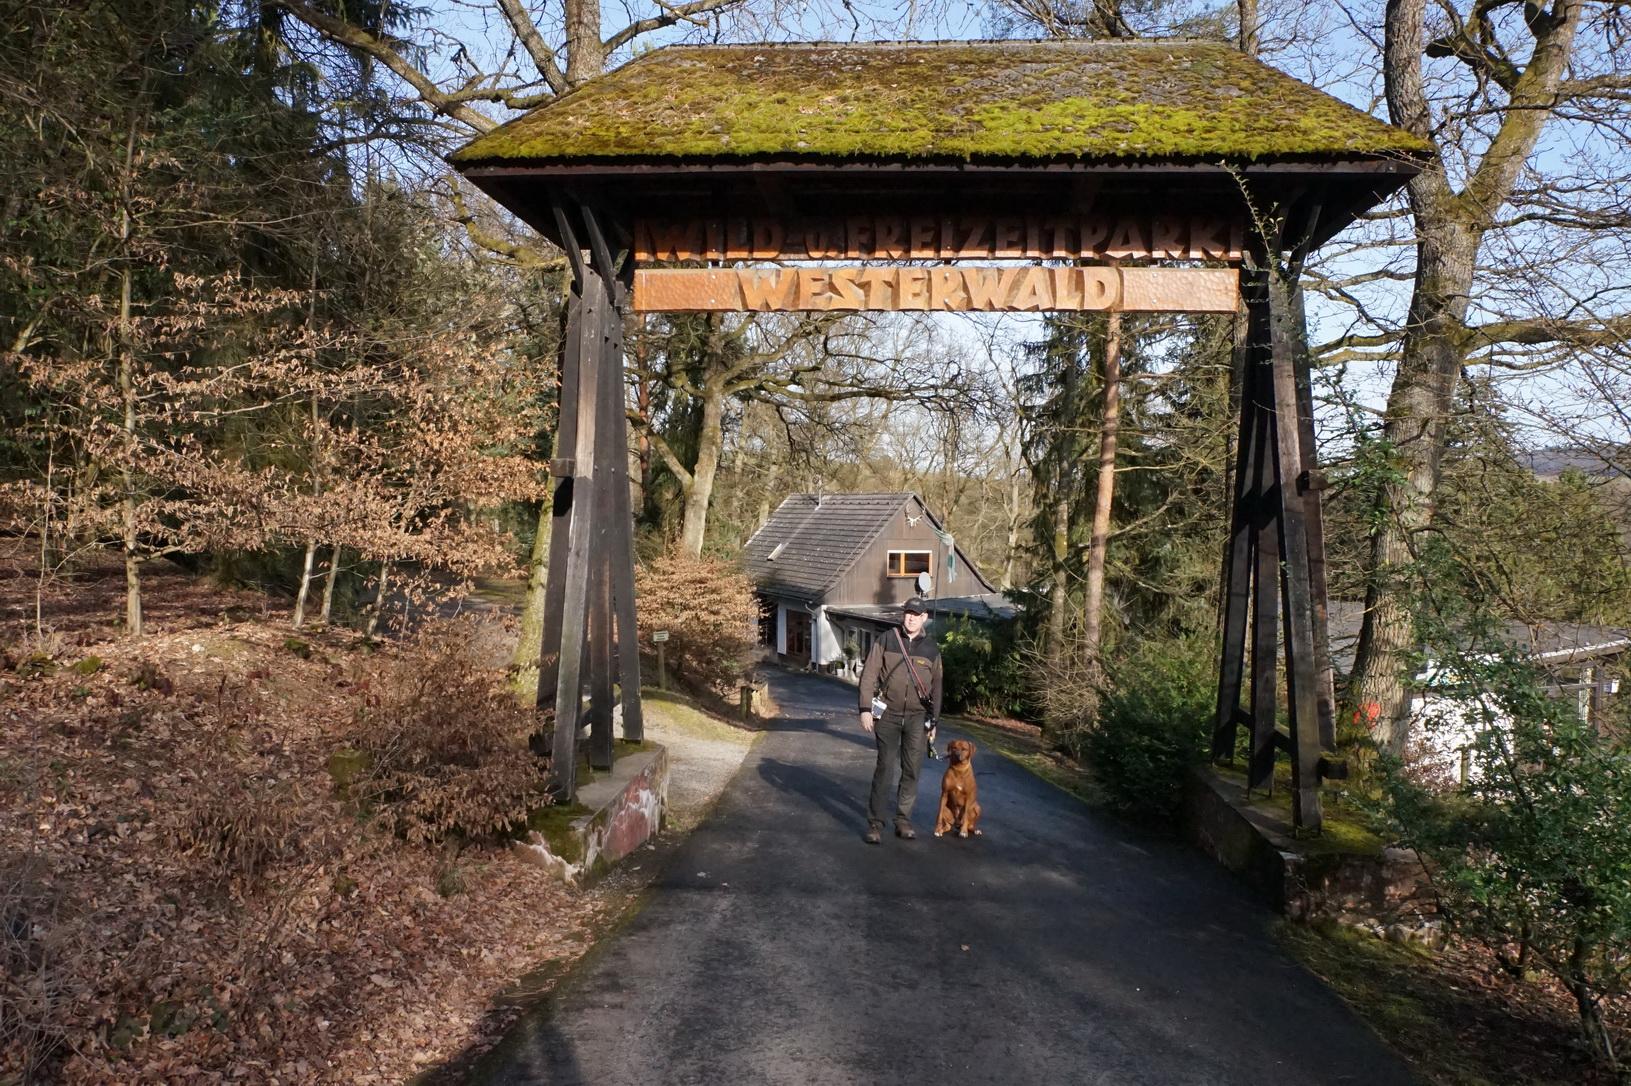 Wildpark Gackenbach Westerwald 1